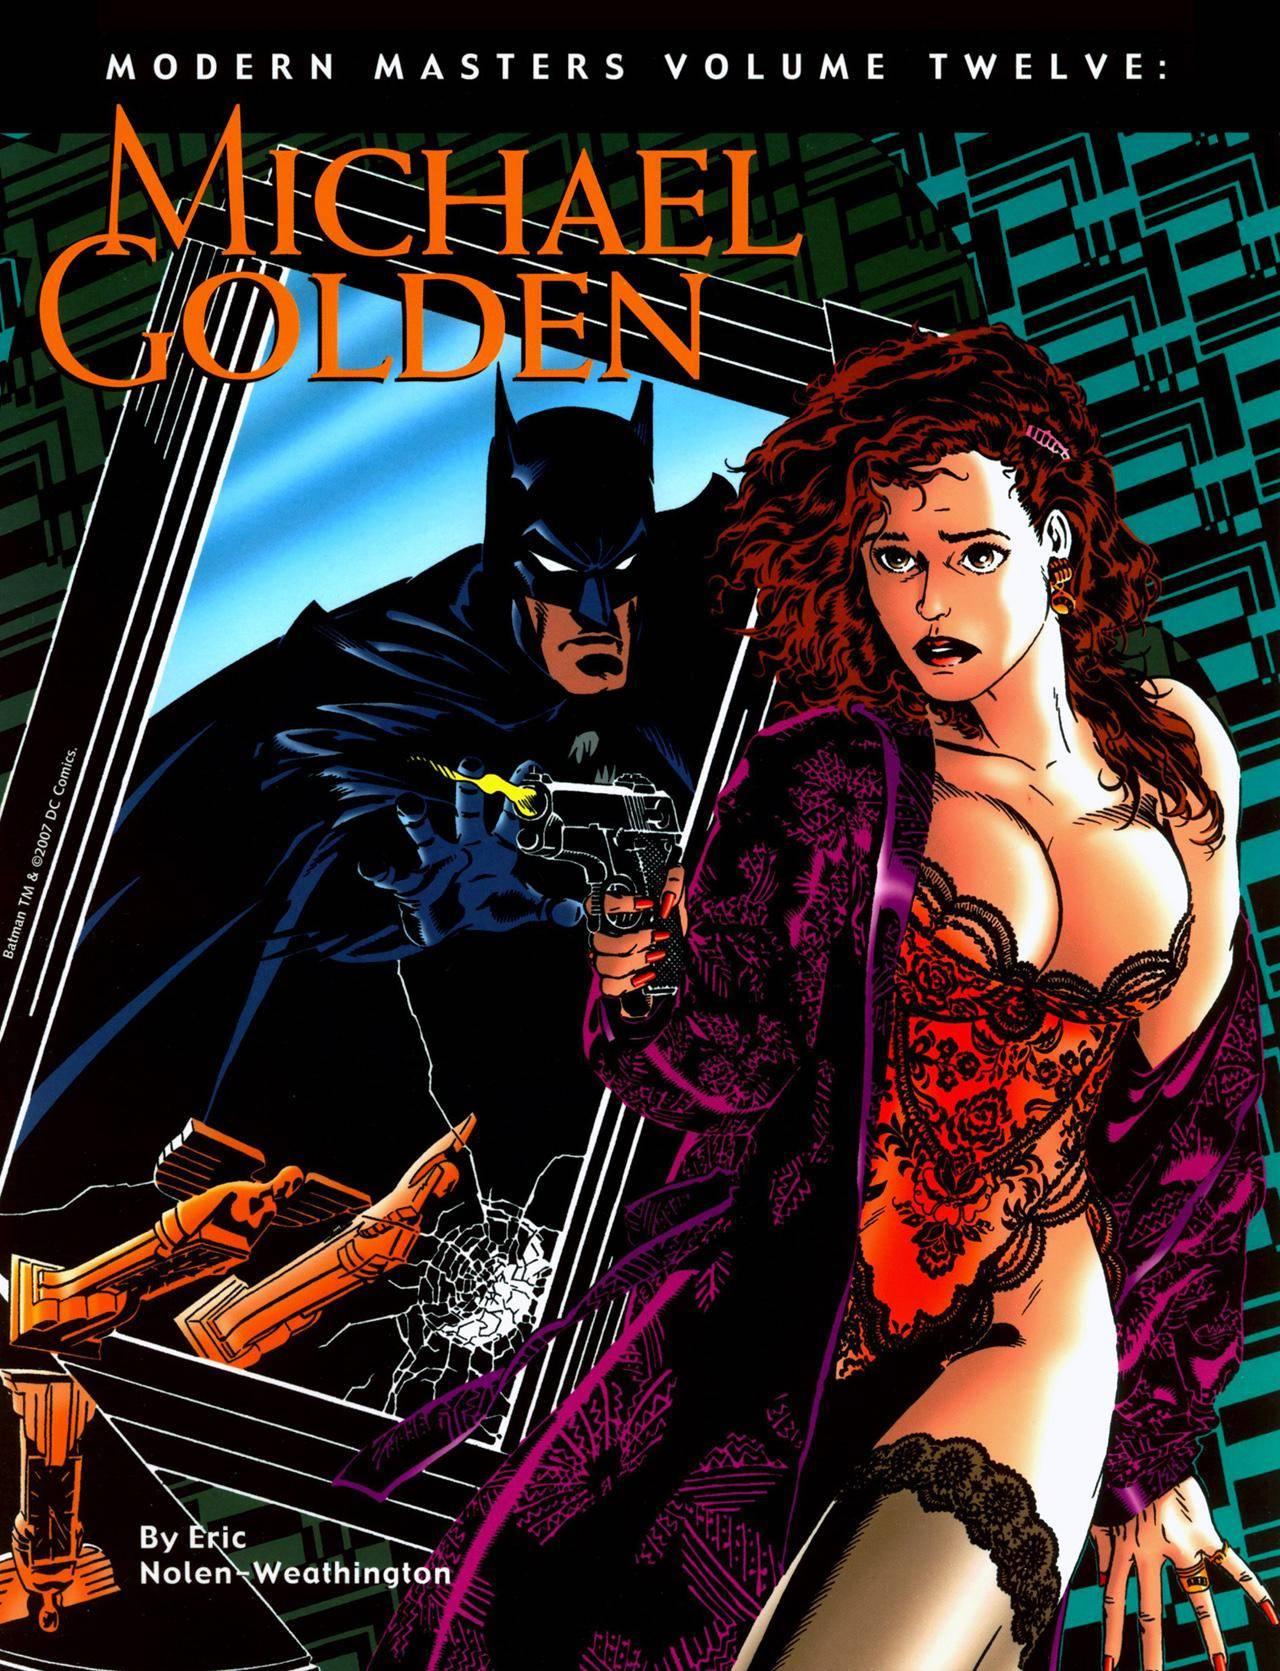 Modern Masters Vol 12 - Michael Golden Bchry - DCP